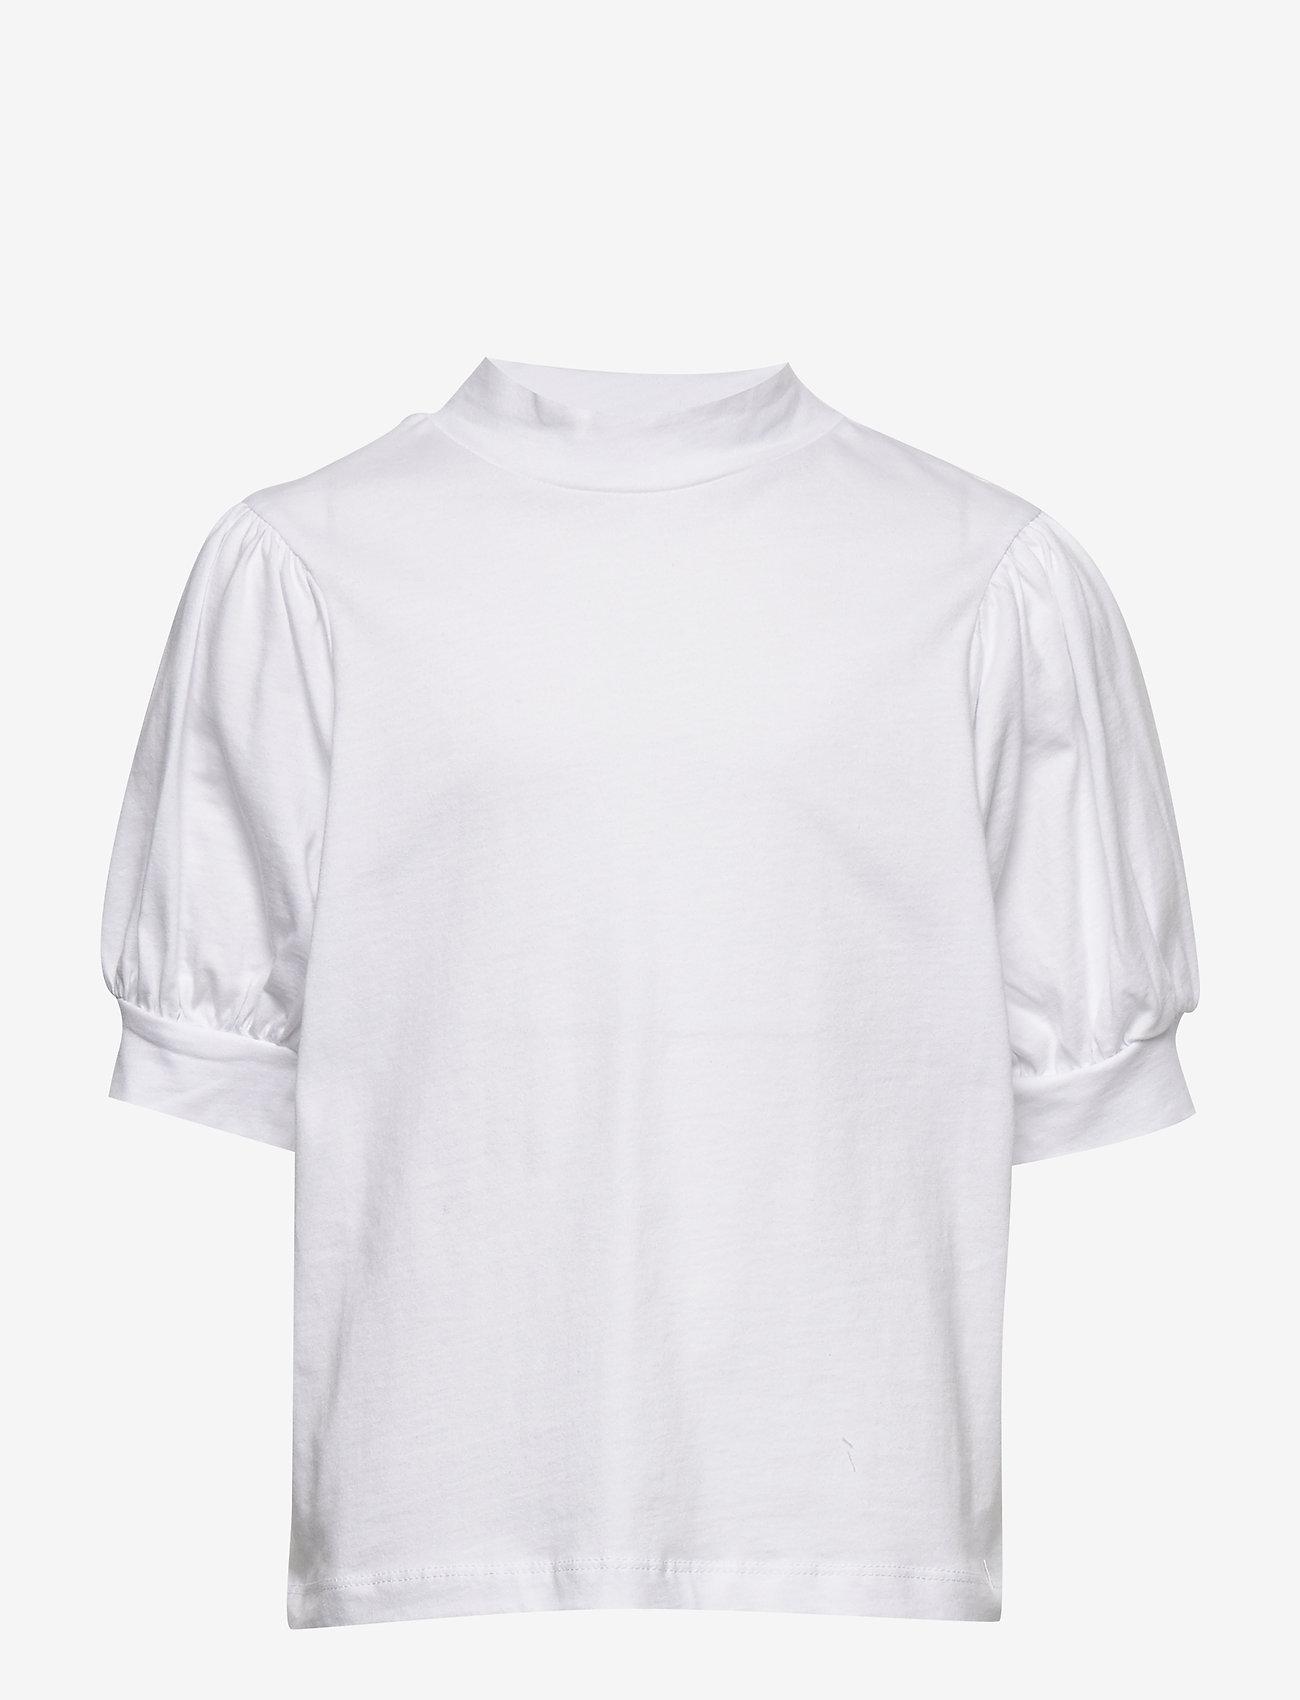 LMTD - NLFFUFF BALLON SHORT TOP - t-shirts - bright white - 0